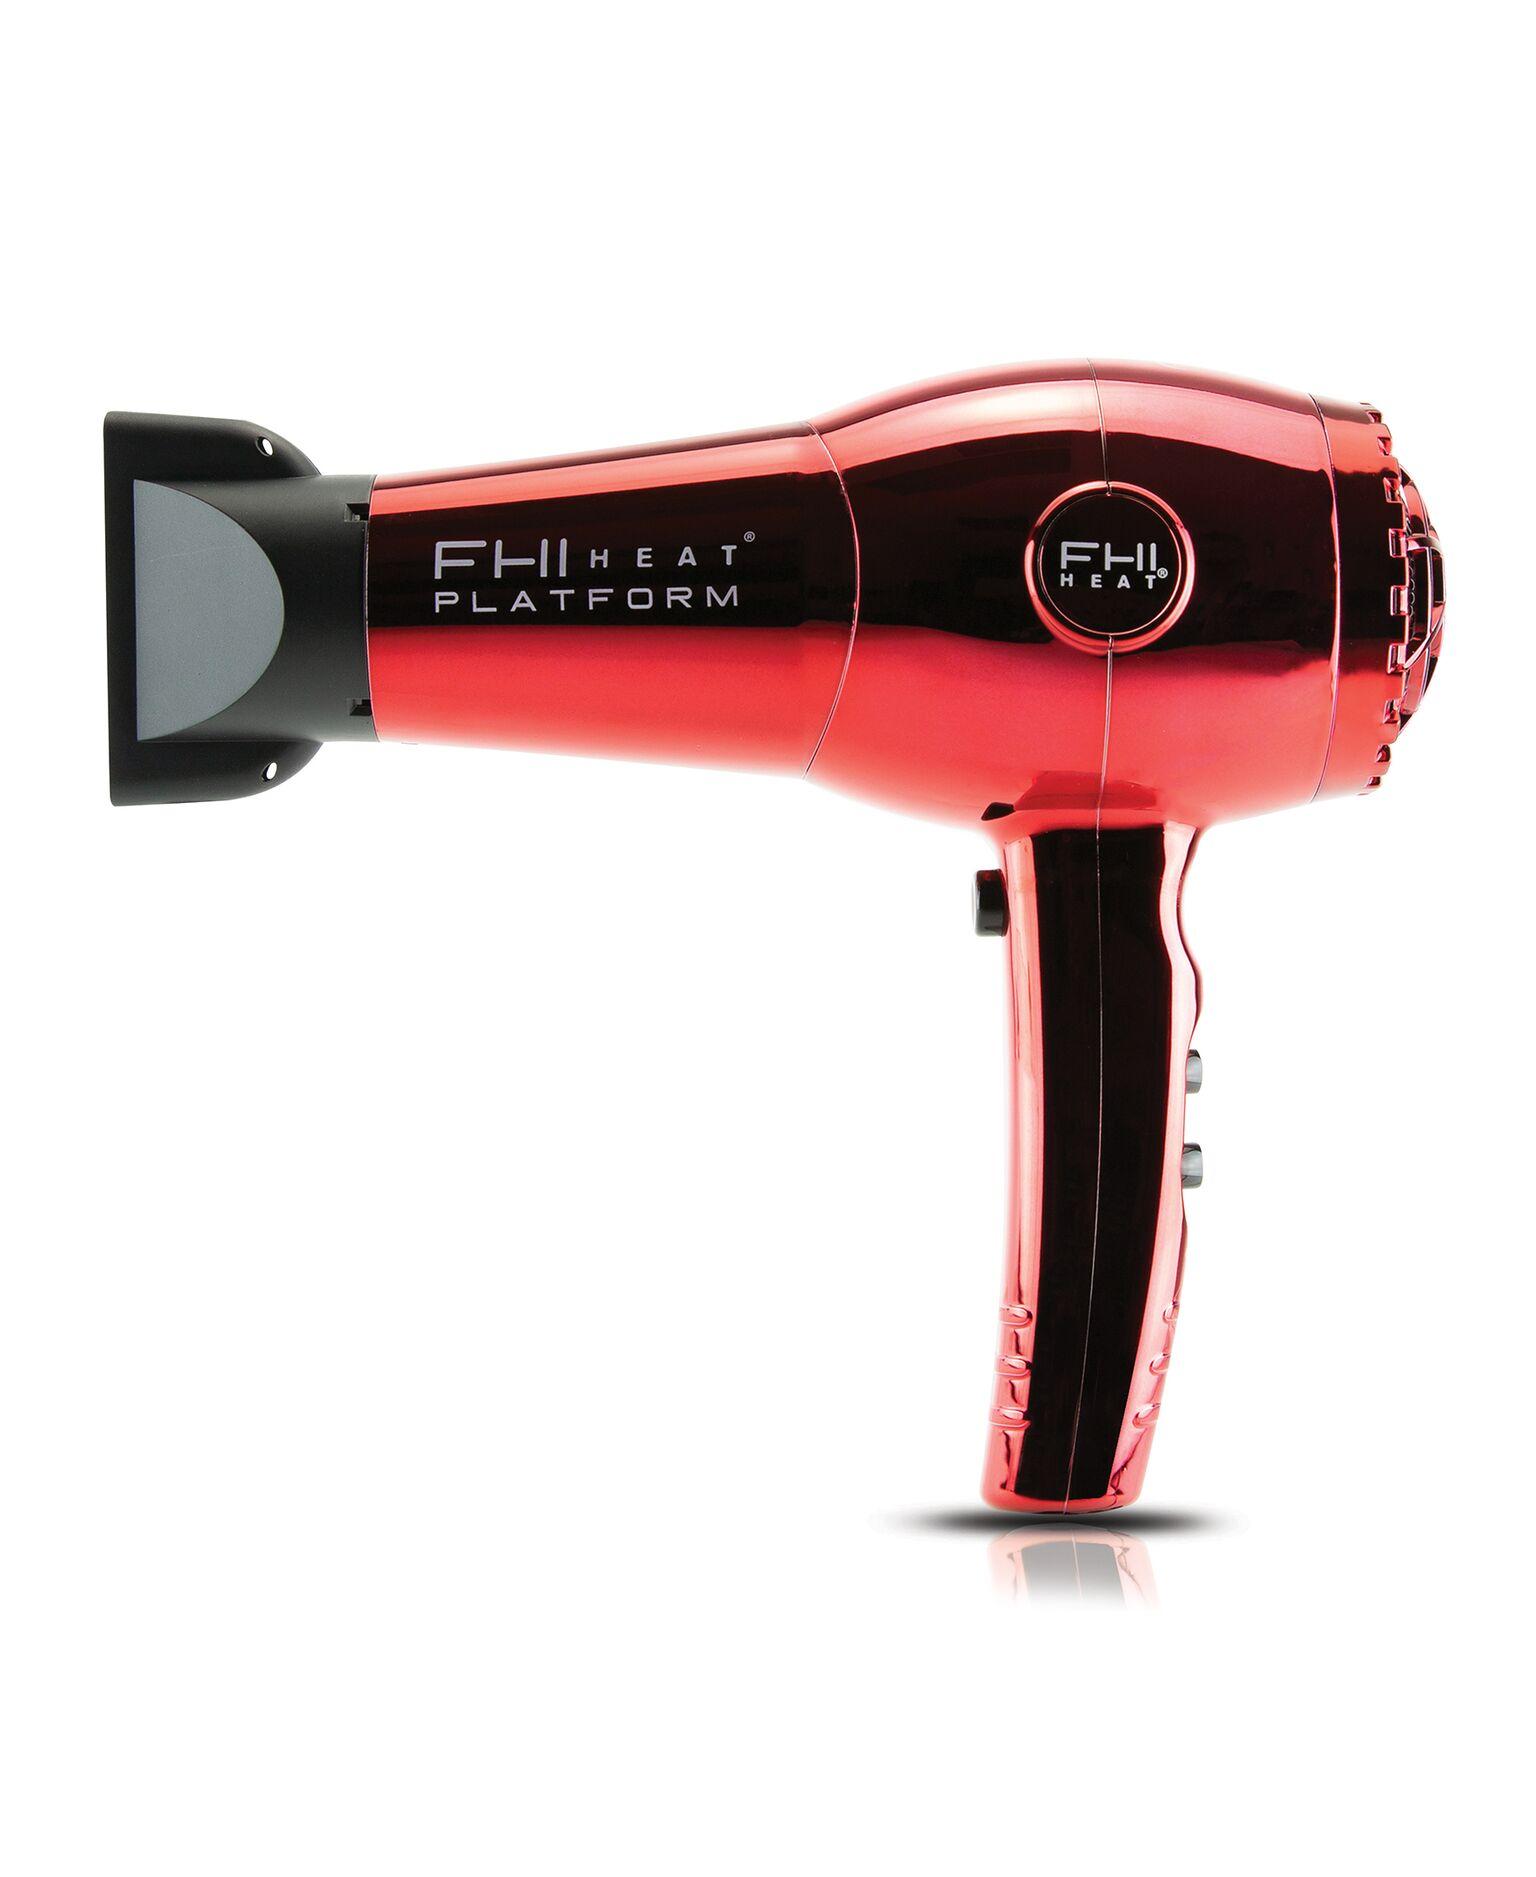 FHI HEAT PF7005RDC RED CHROME HAIR DRYER NANO LITE PRO 1900